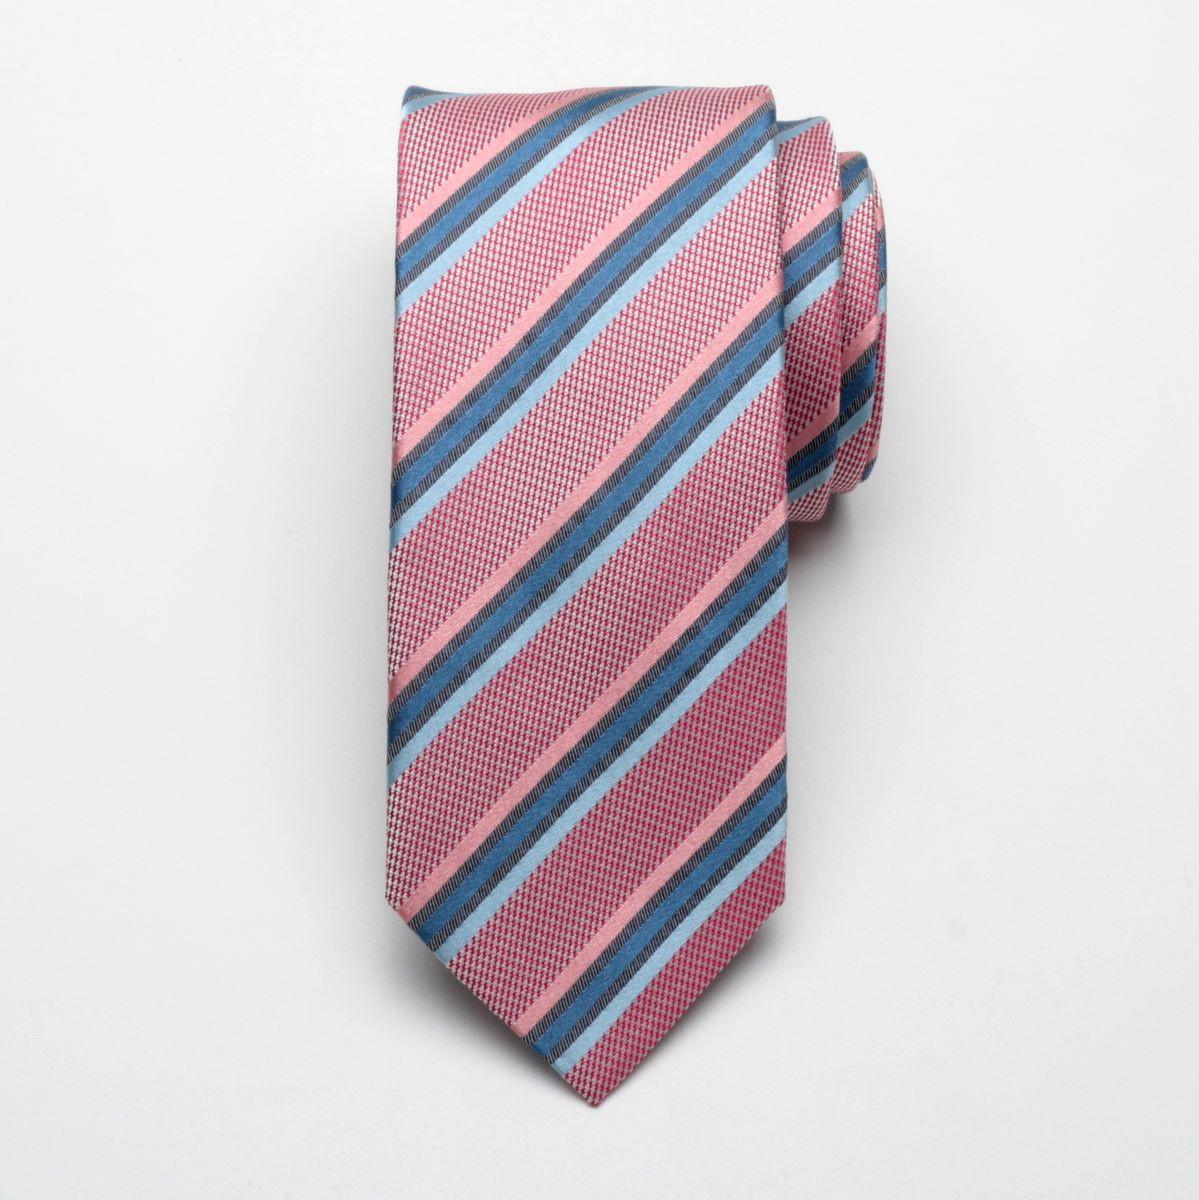 Krawat jedwabny Fine Selection (wzór 56)